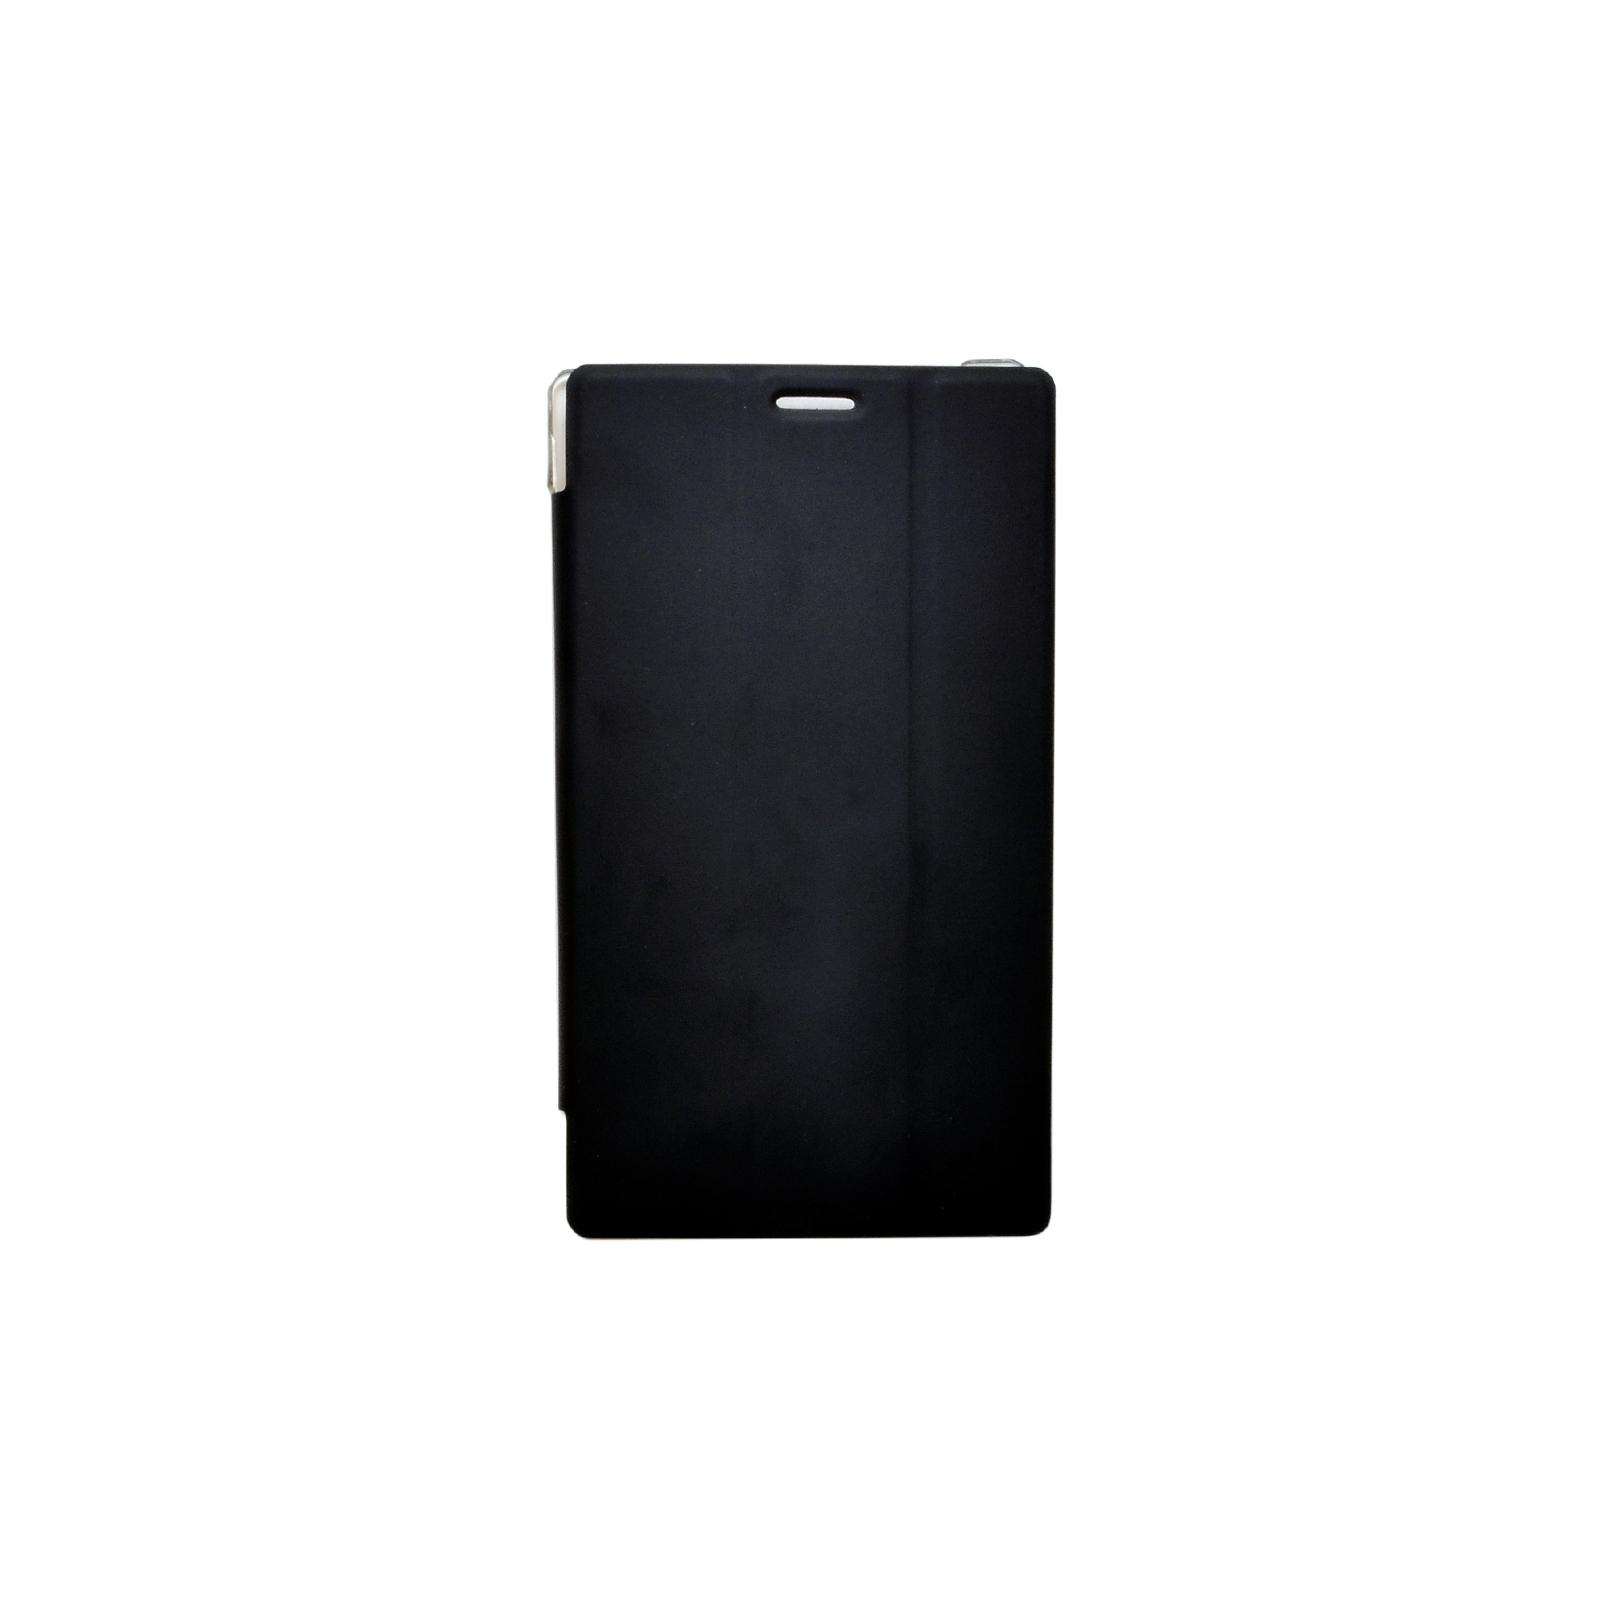 "Чехол для планшета Pro-case 7"" Lenovo Tablet 2 A7-10 Black (CP-706 BK)"